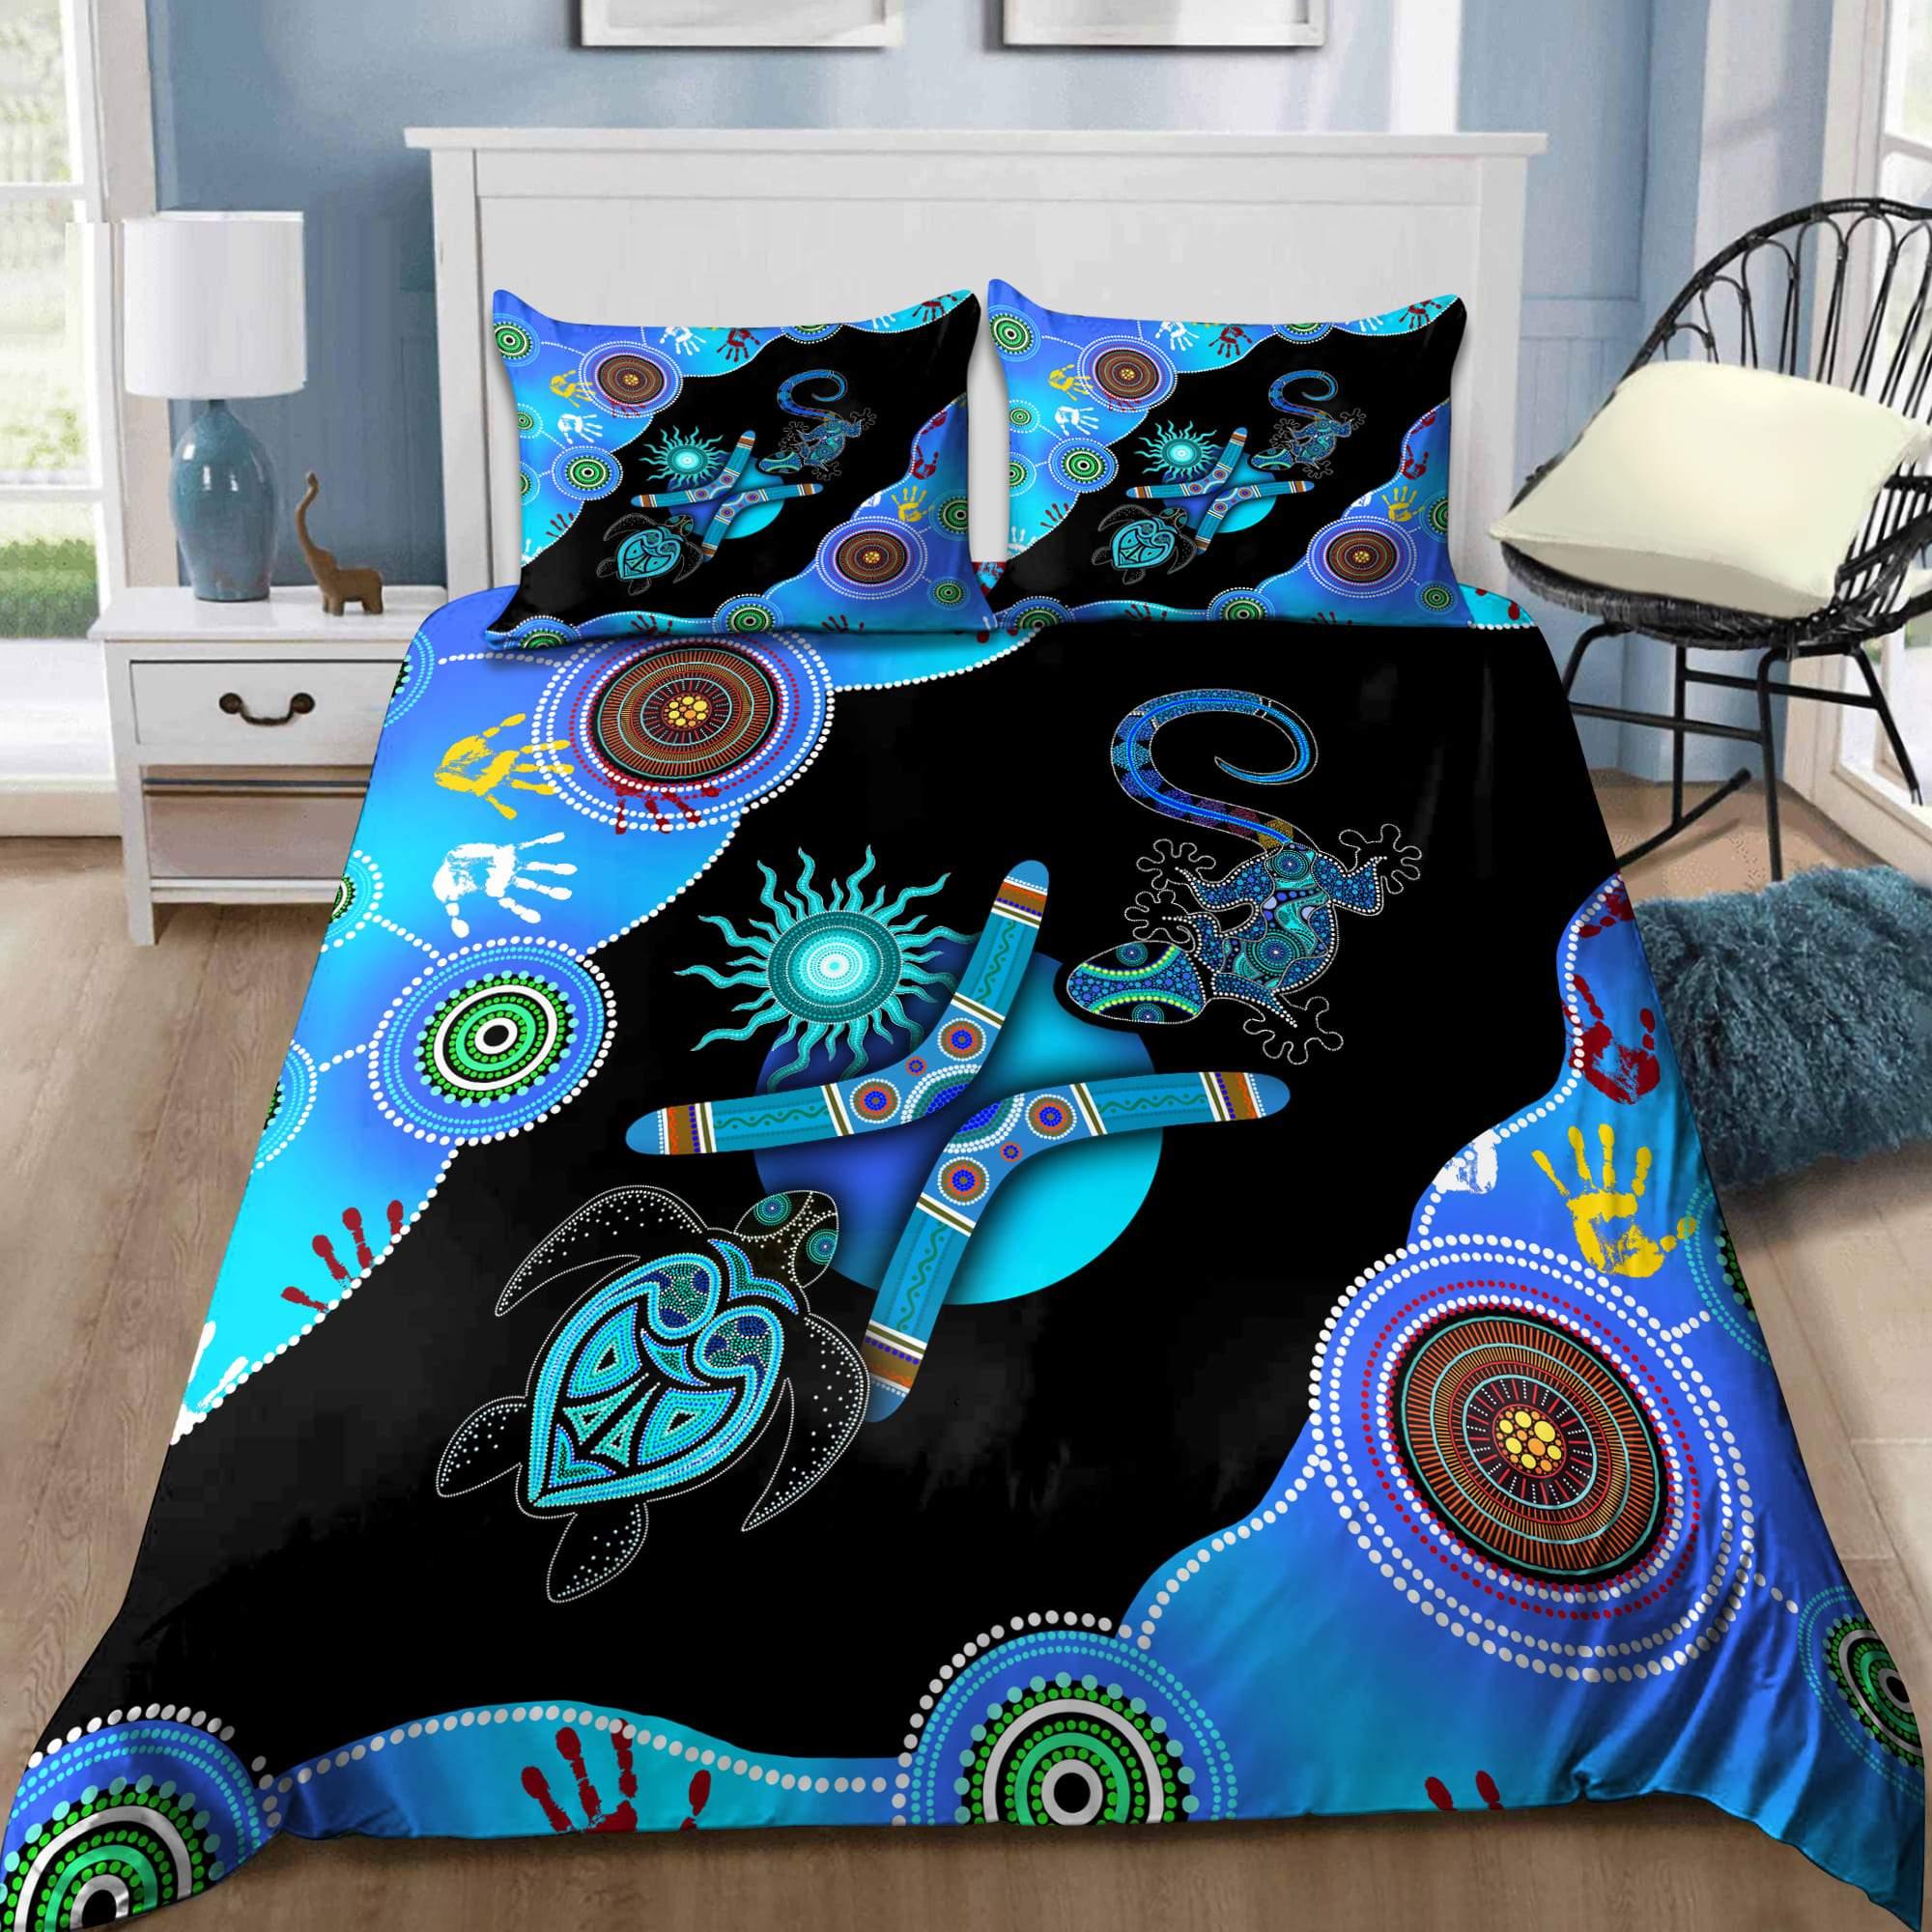 Aboriginal Naidoc Week 2021 Blue Turtle Lizard Bedding set